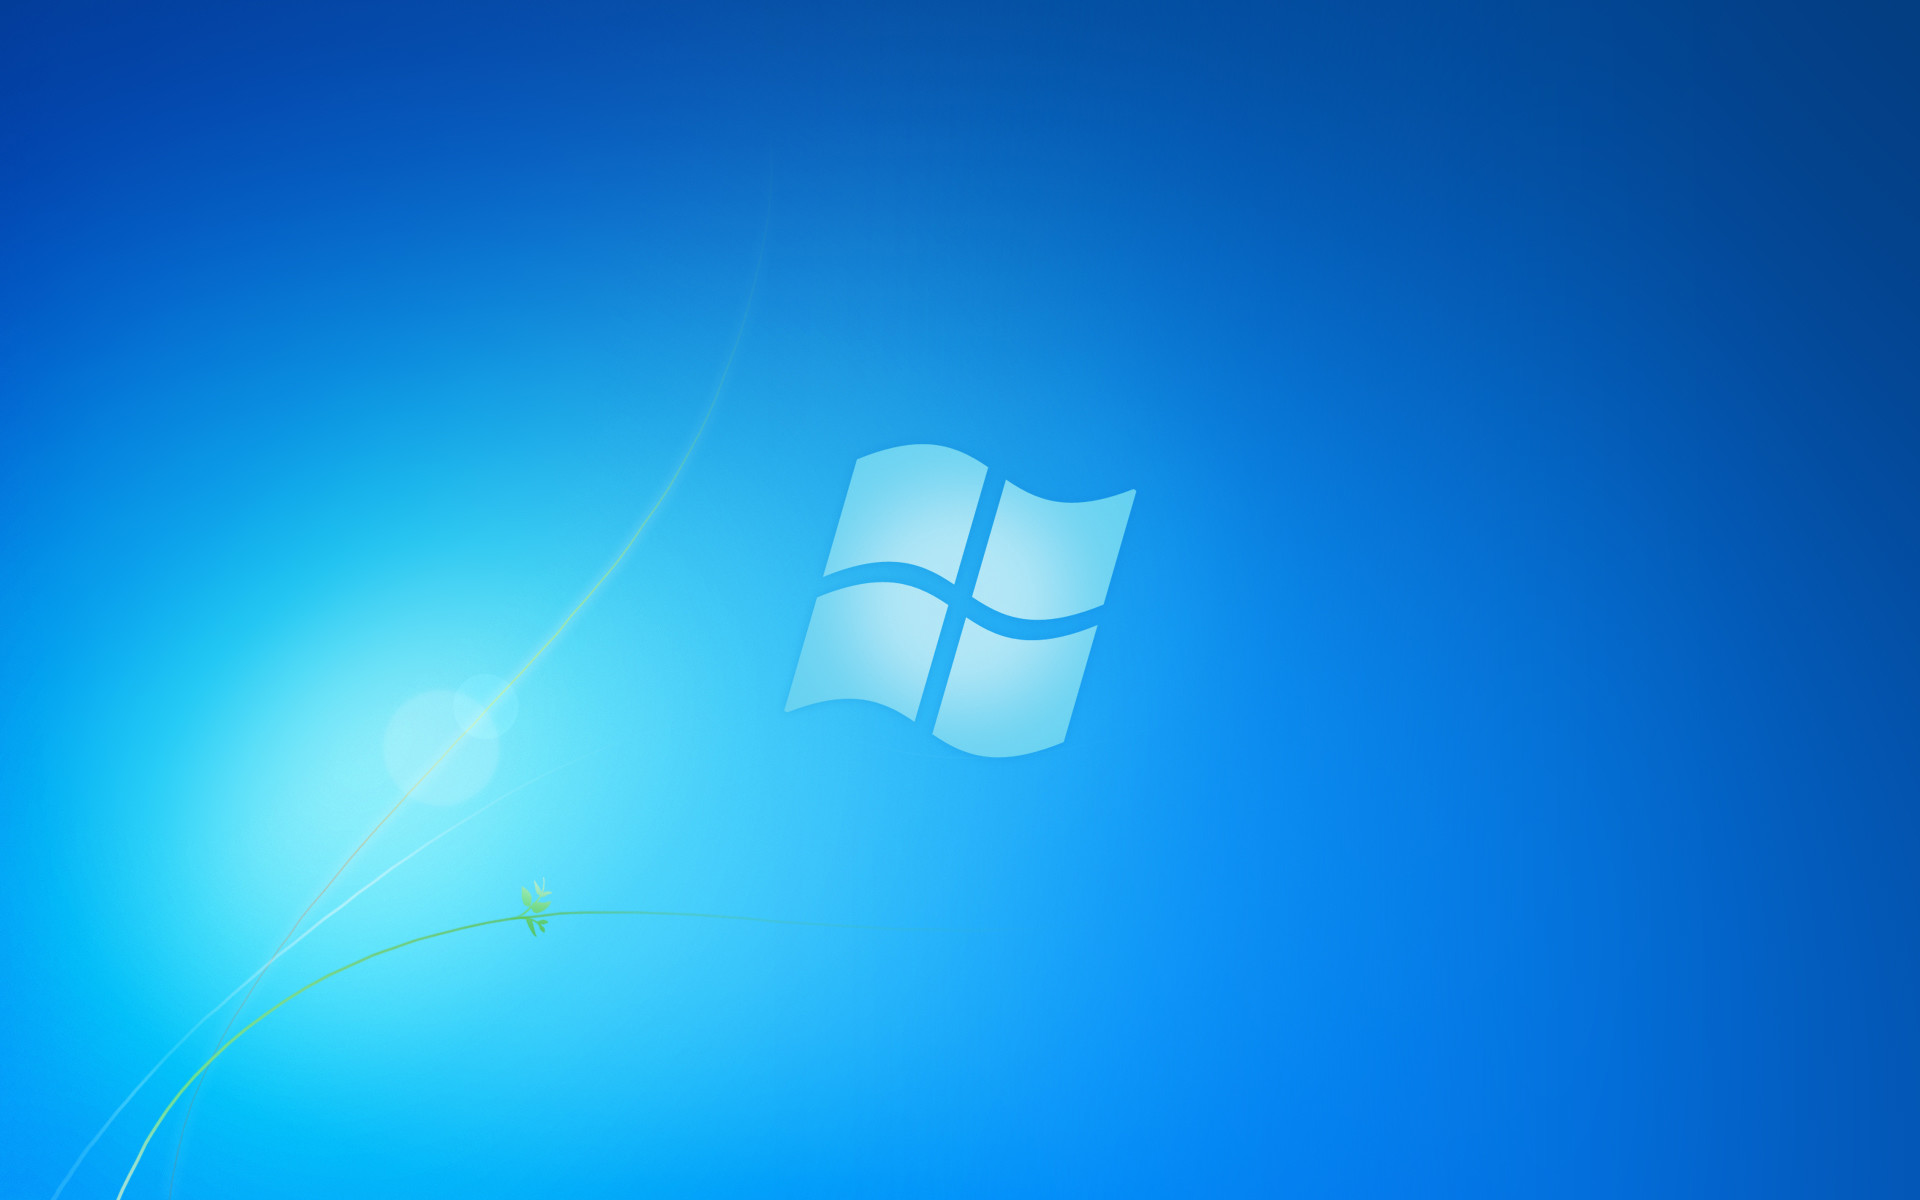 Windows 7 Background Desktop 62 images 1920x1200